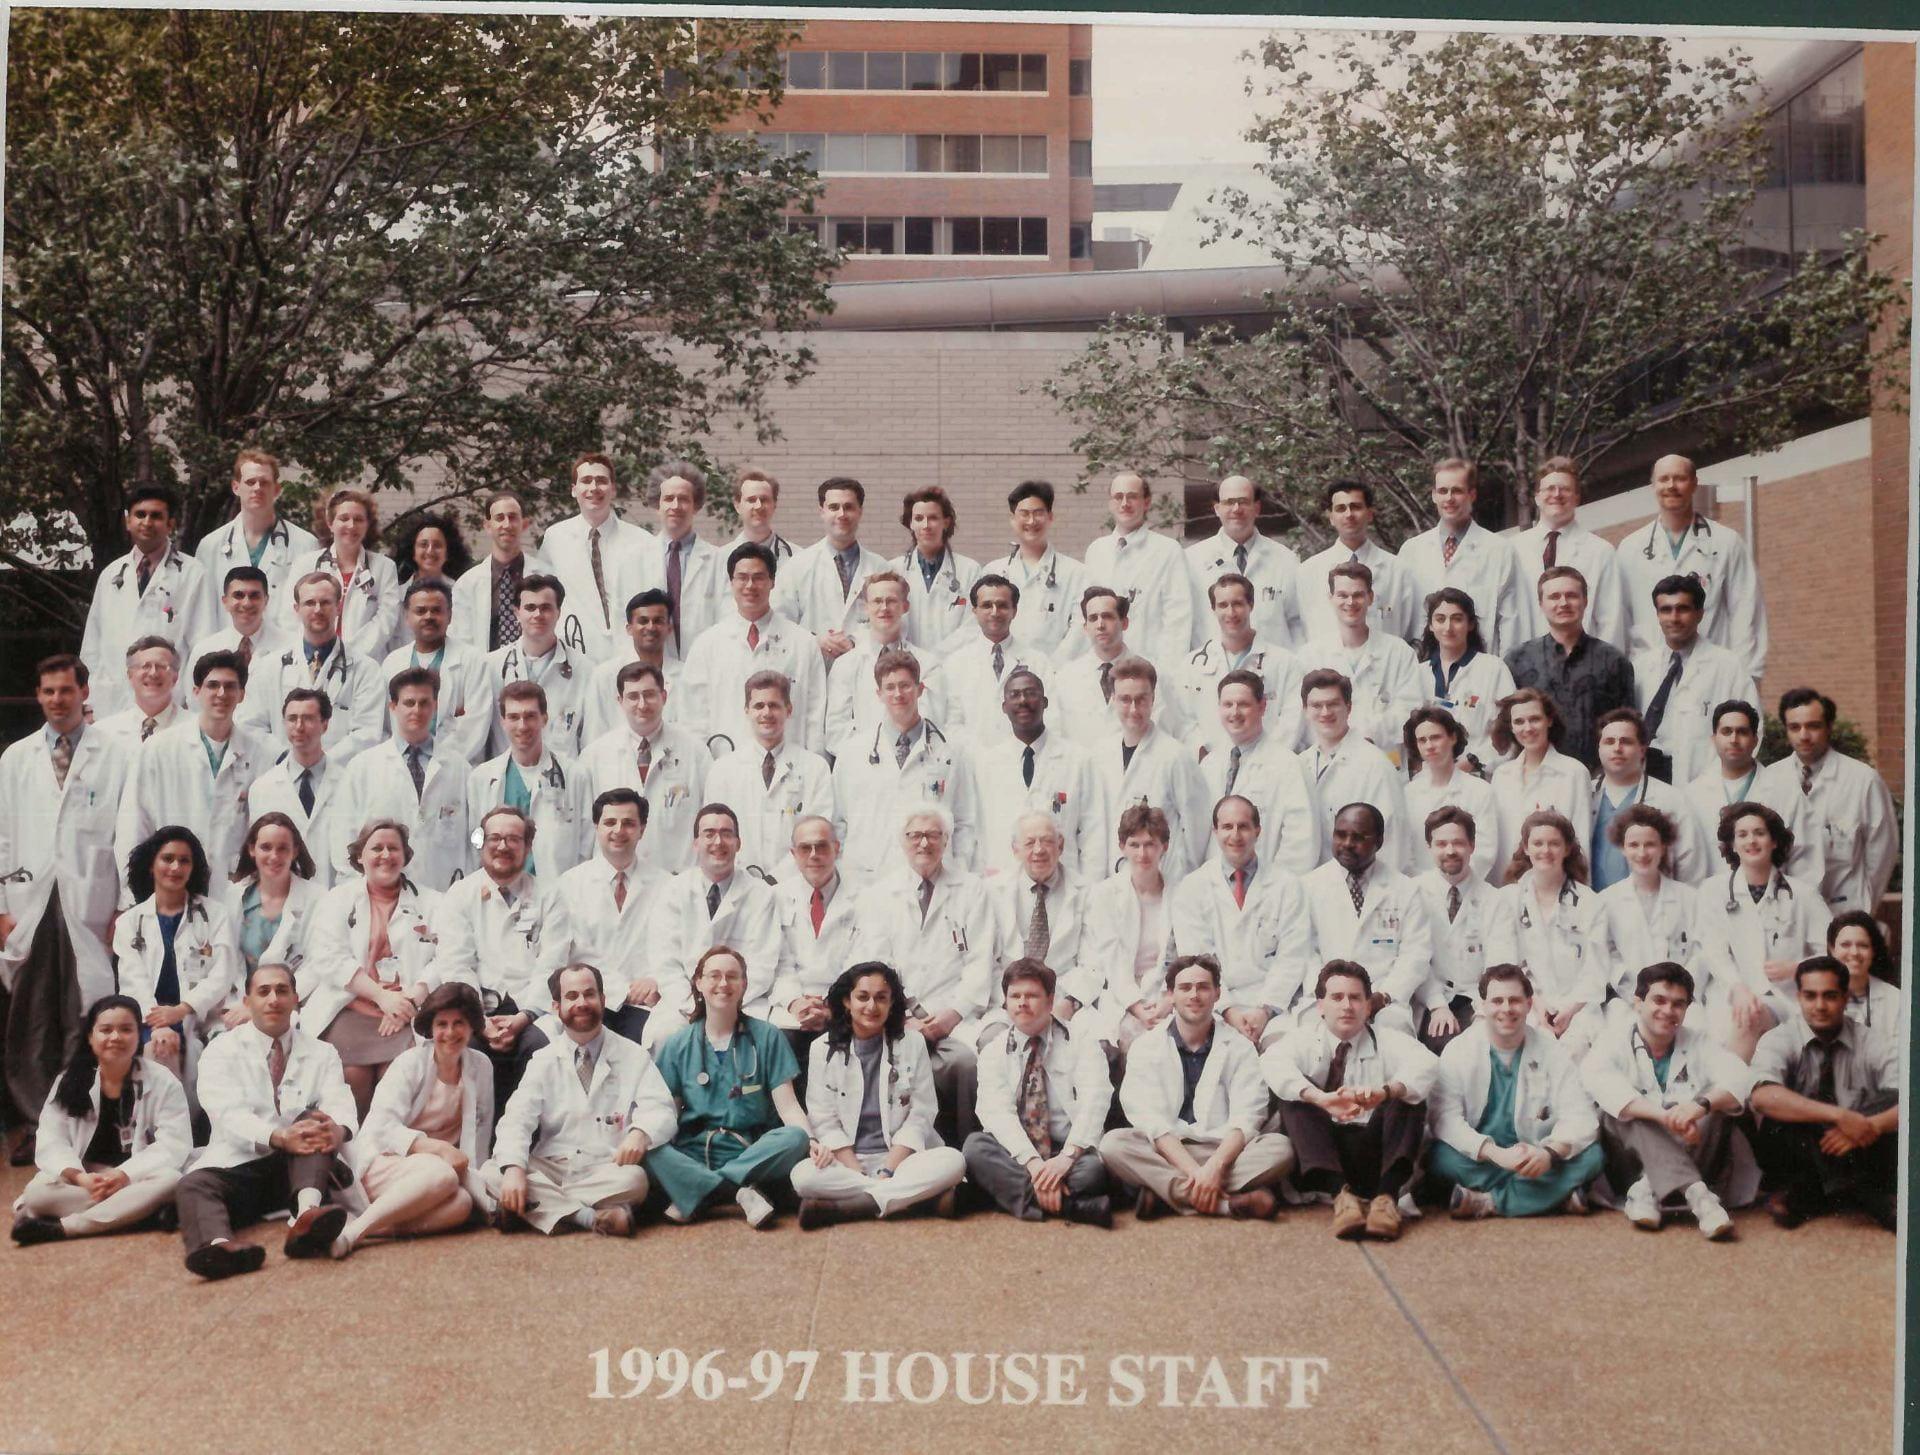 1996 Housestaff Photo